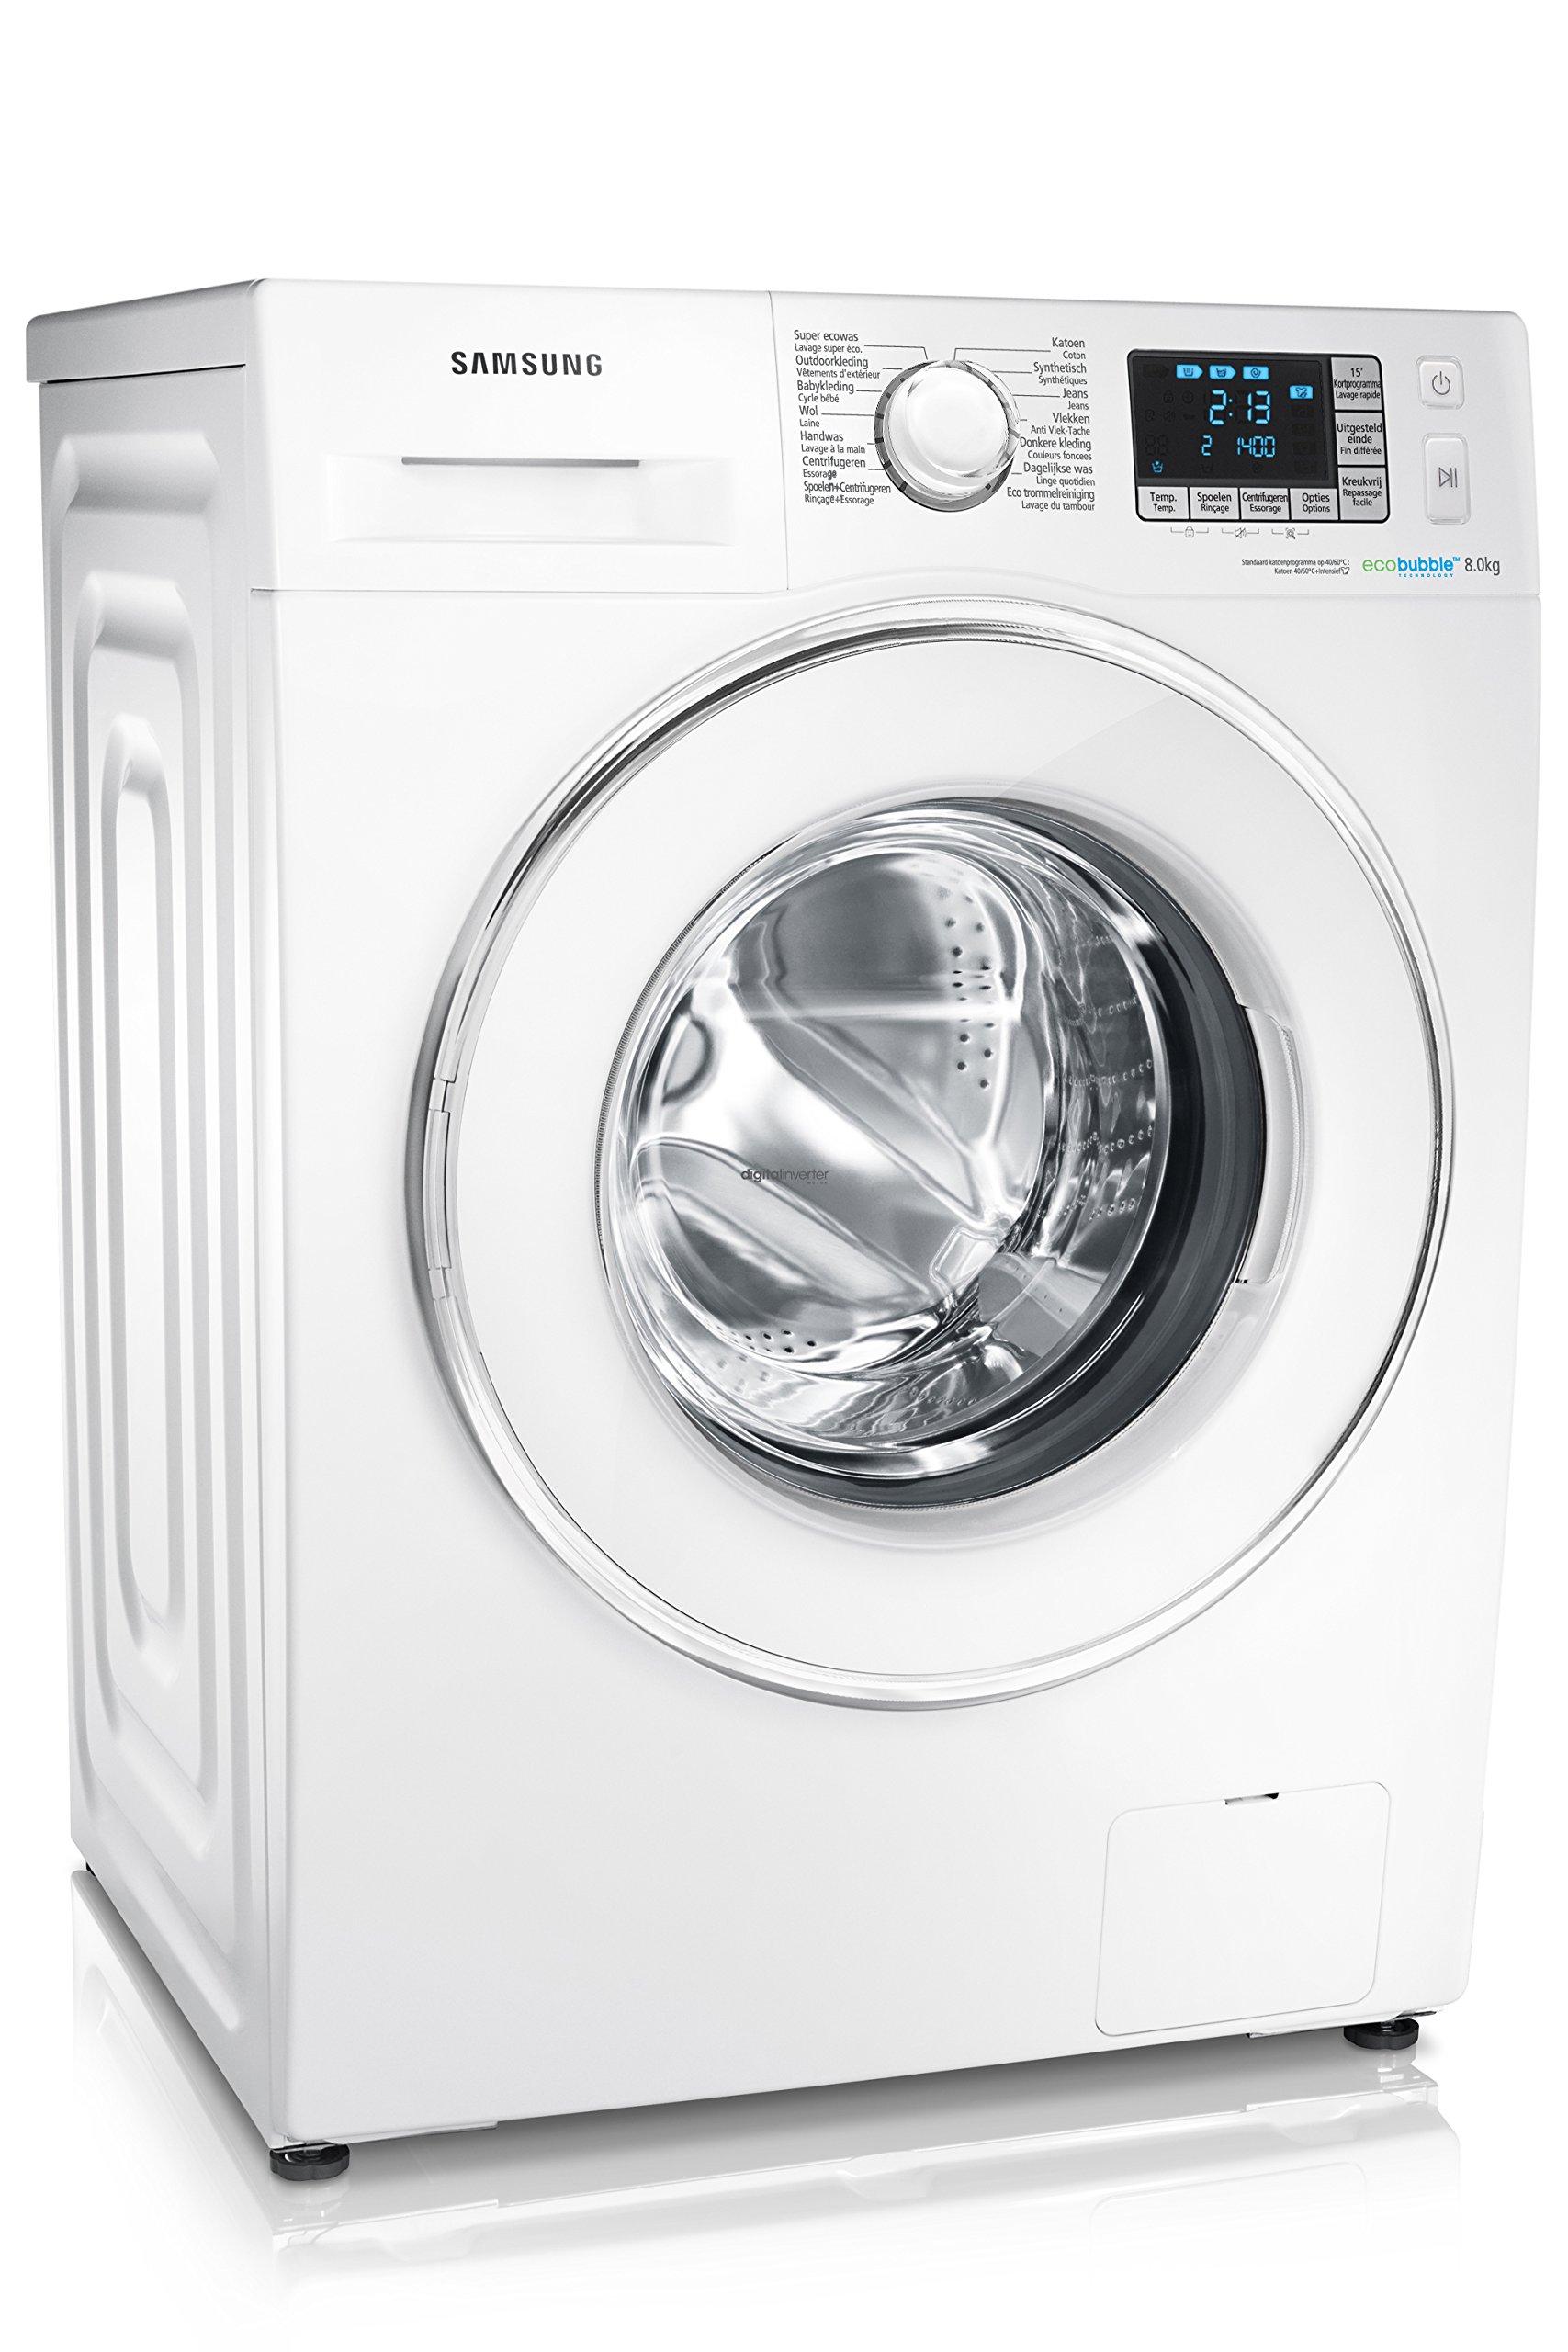 wf81-F5e5p4-W-Samsung-Waschmaschine-8-kg-ecobubble-Tr-Kristall-Wei-DIGITAL-INVERTER-MOTOR-1400-Umin-A-aa